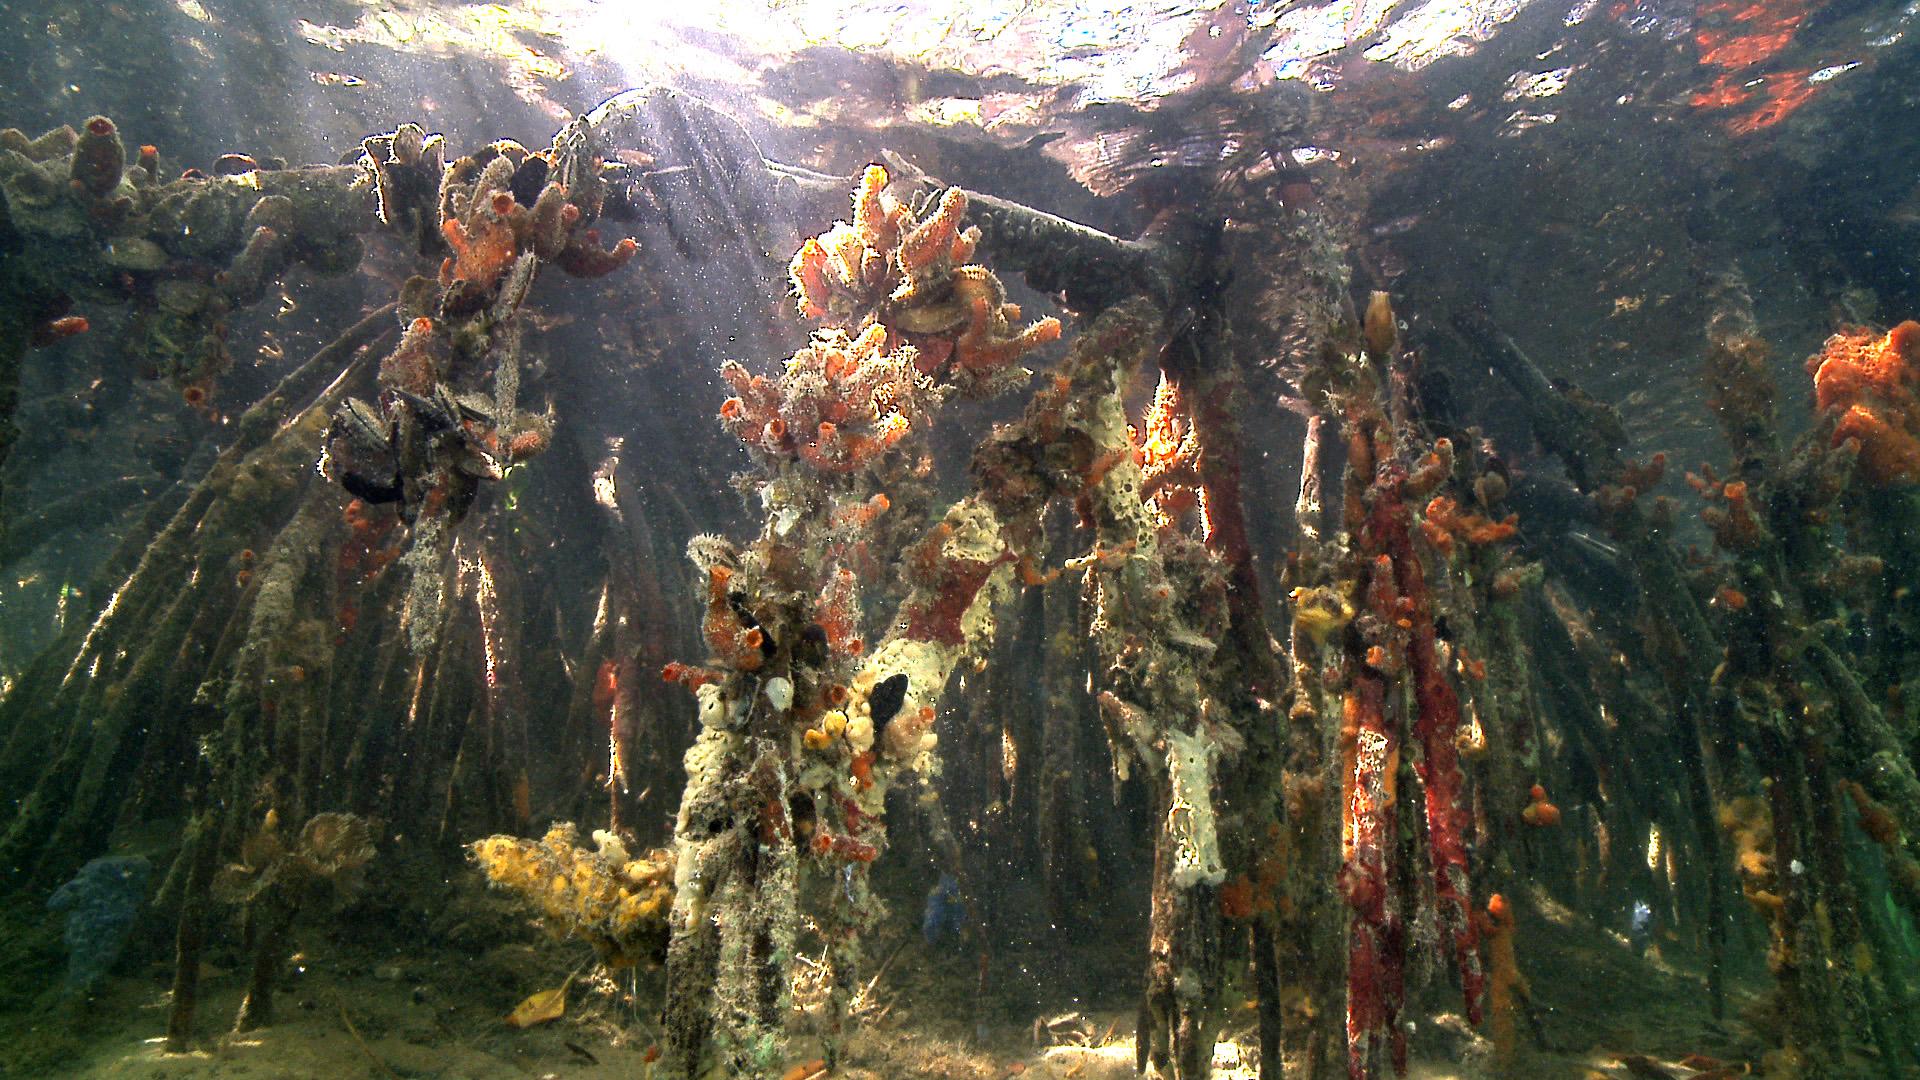 Mangrove PR